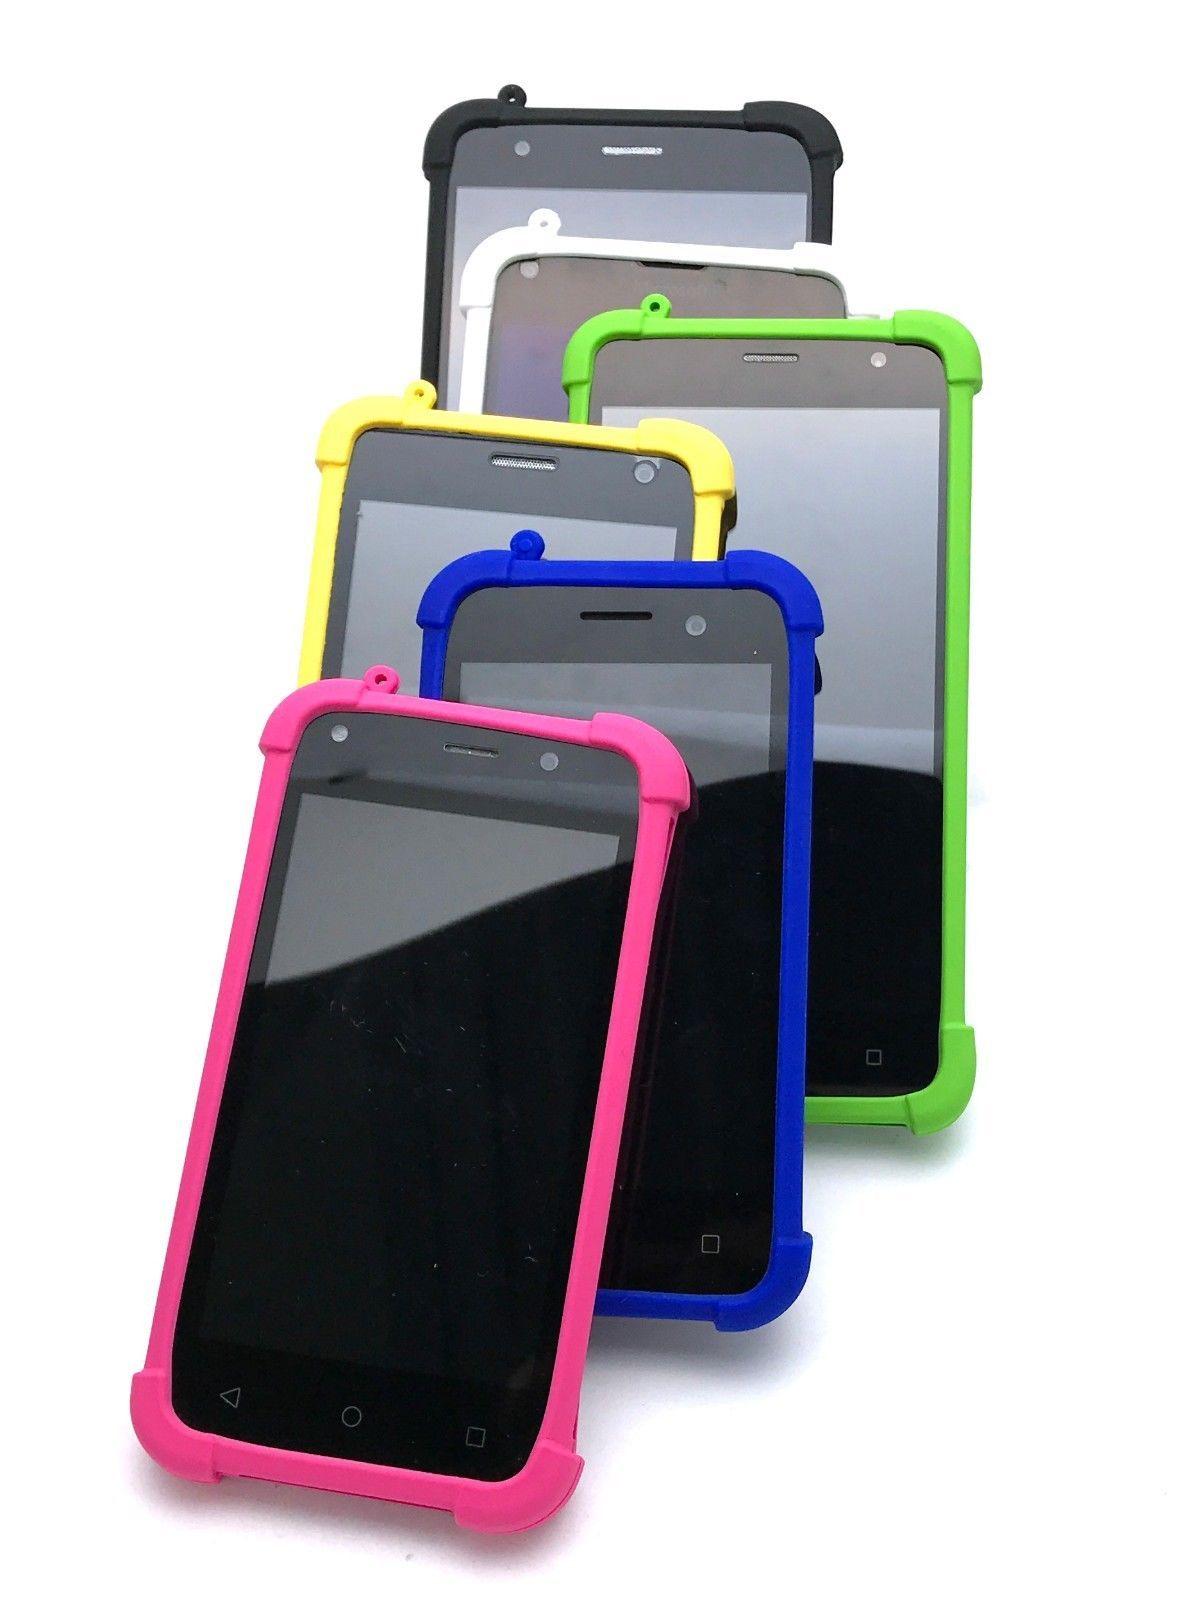 quality design d5830 a02c1 6.99AUD - Silicone Case Cover For Vodafone/Optus/Telstra/Aspera ...